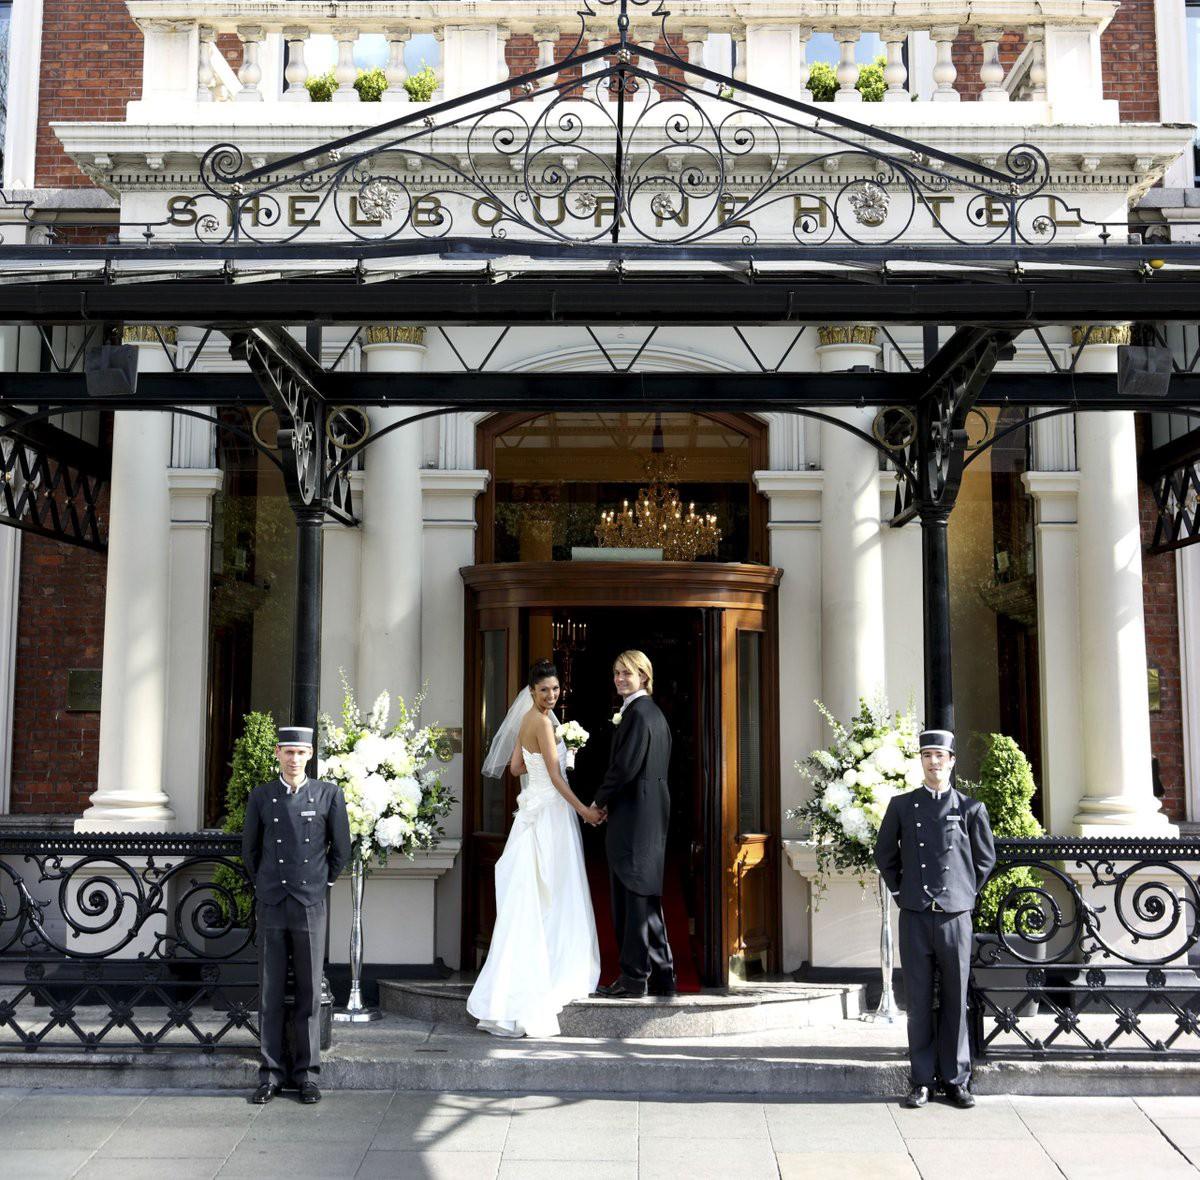 Top 10 Wedding Venues 2017